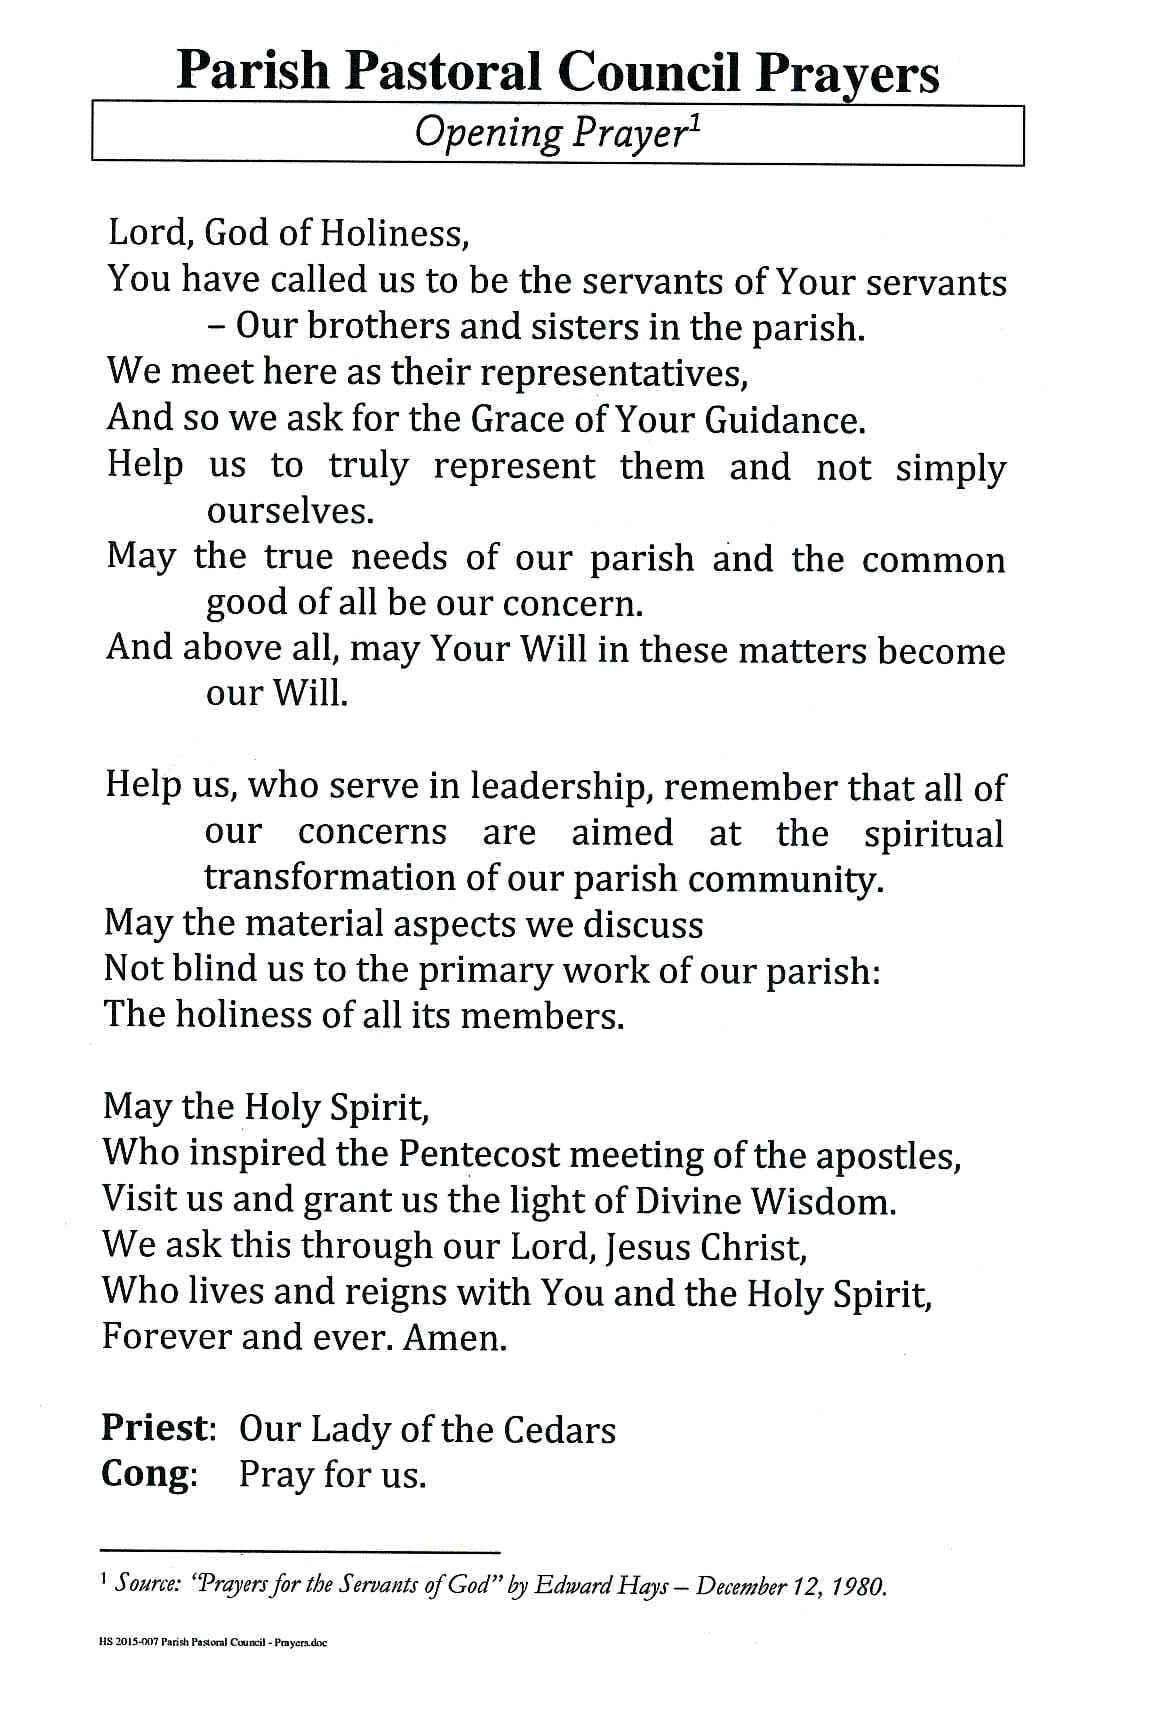 Parish Council Prayers 2015-1.jpg